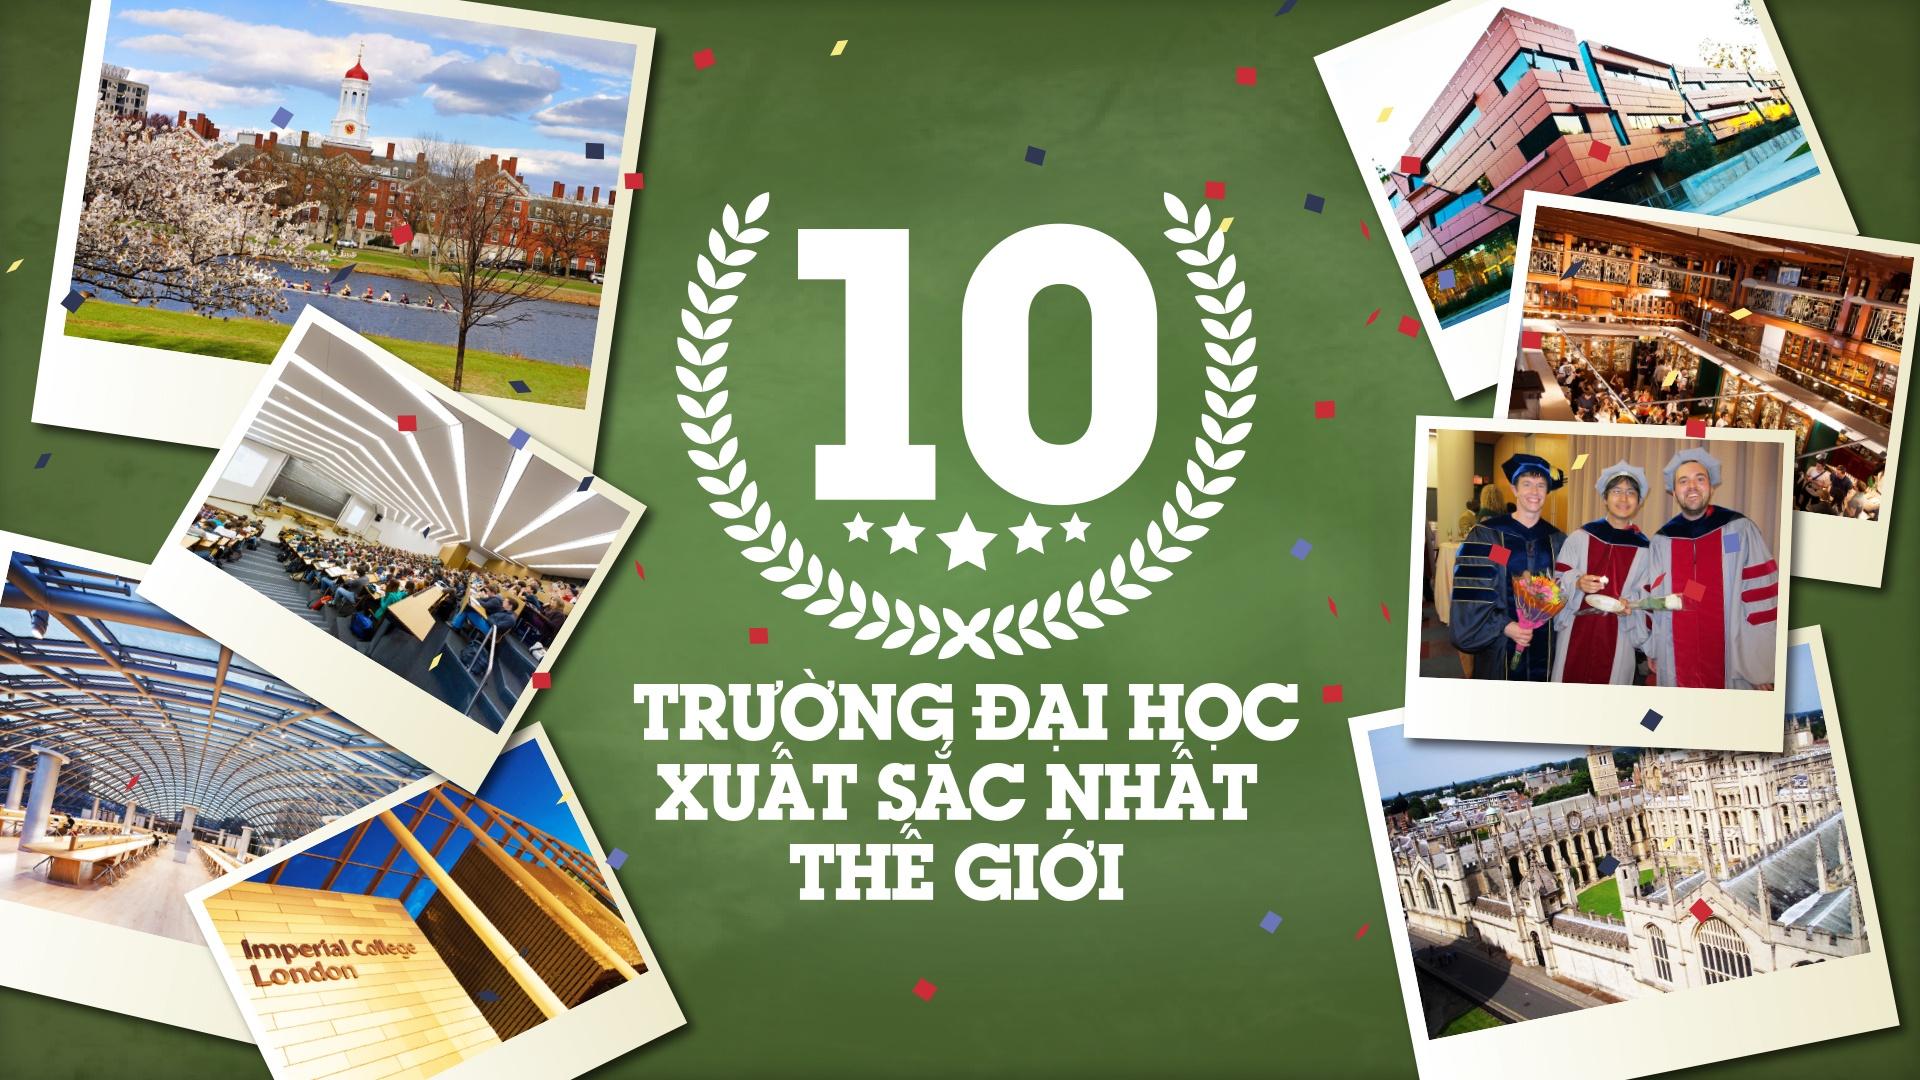 10 truong dai hoc xuat sac nhat the gioi hinh anh 1